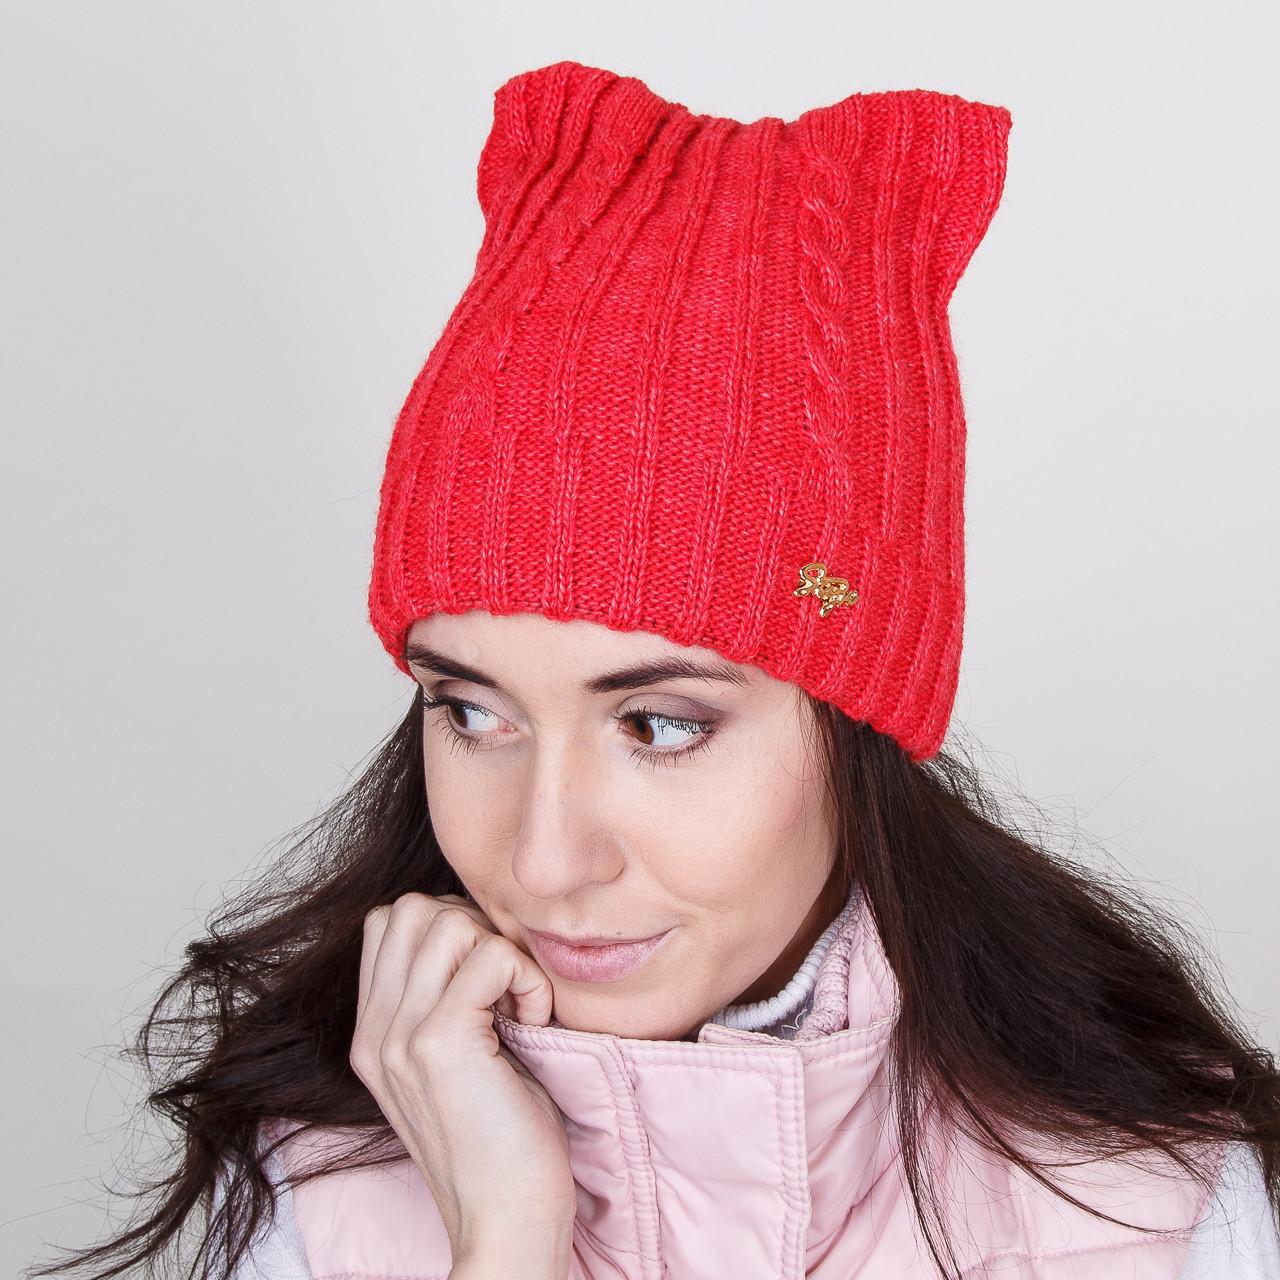 Стильная зимняя женская шапка - Кошка - Артикул W-2a